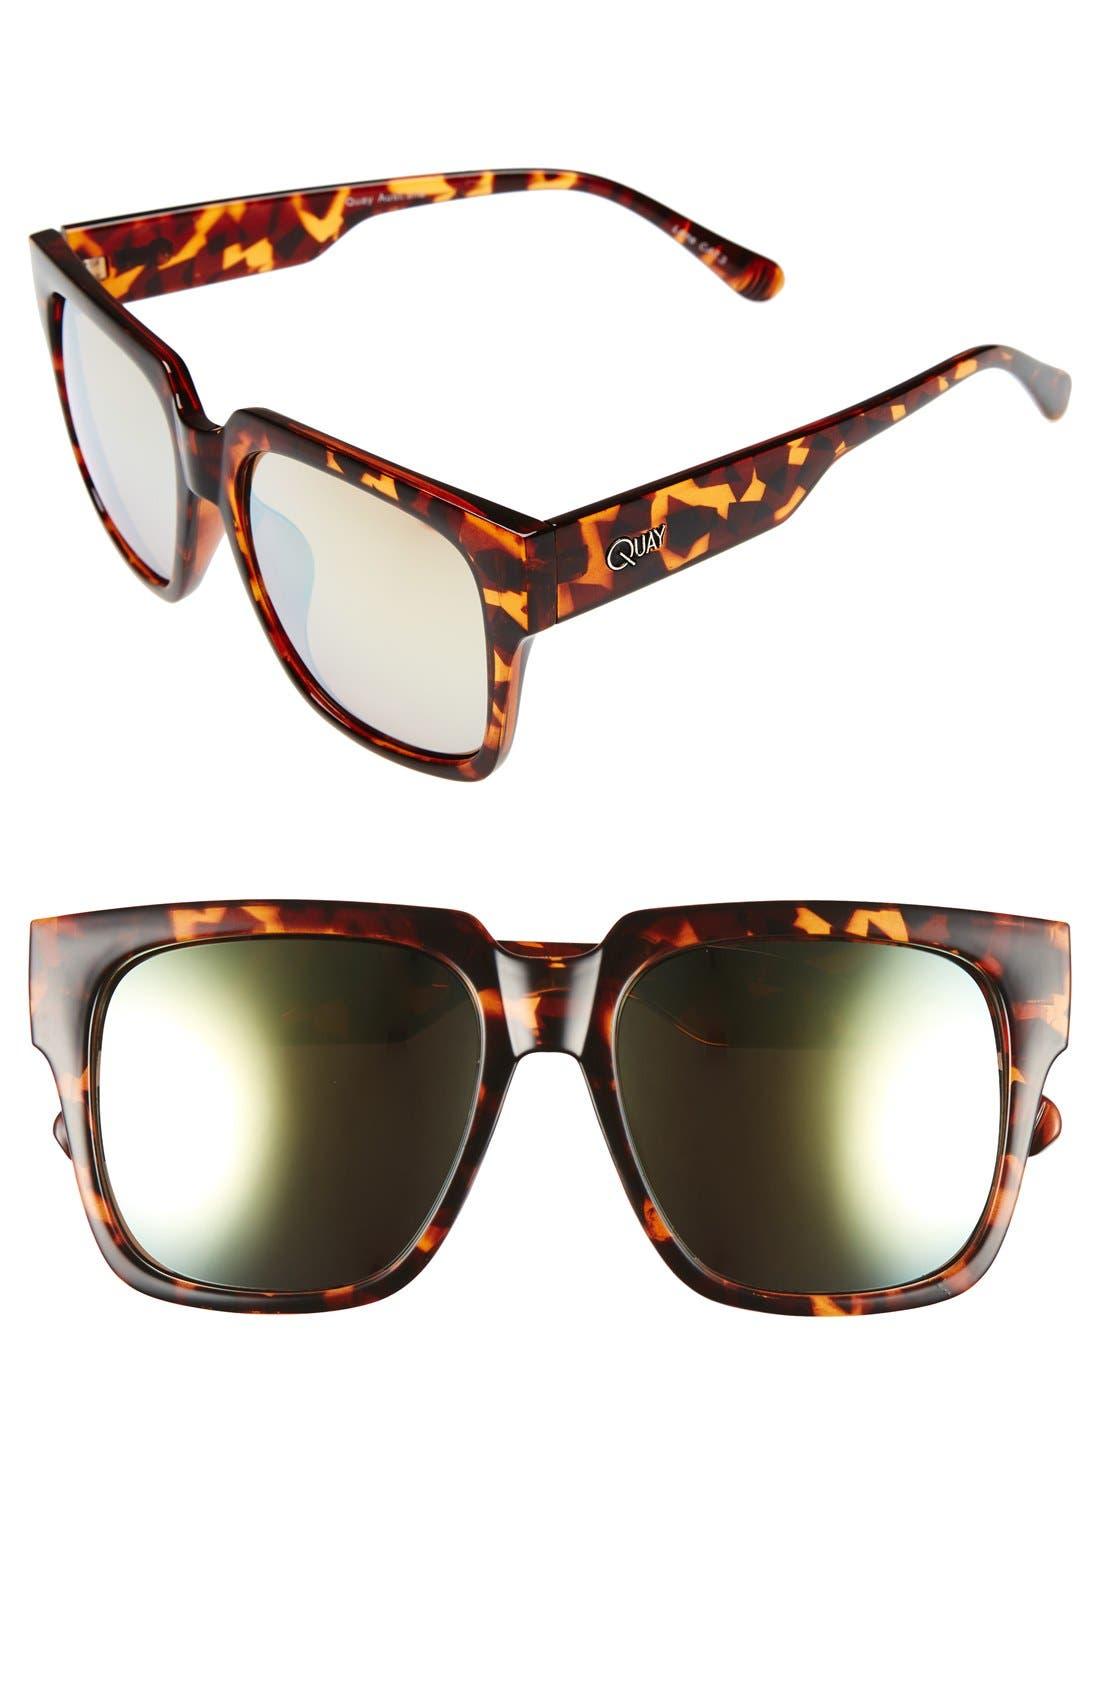 Alternate Image 1 Selected - Quay Australia 'On the Prowl' 55mm Square Sunglasses